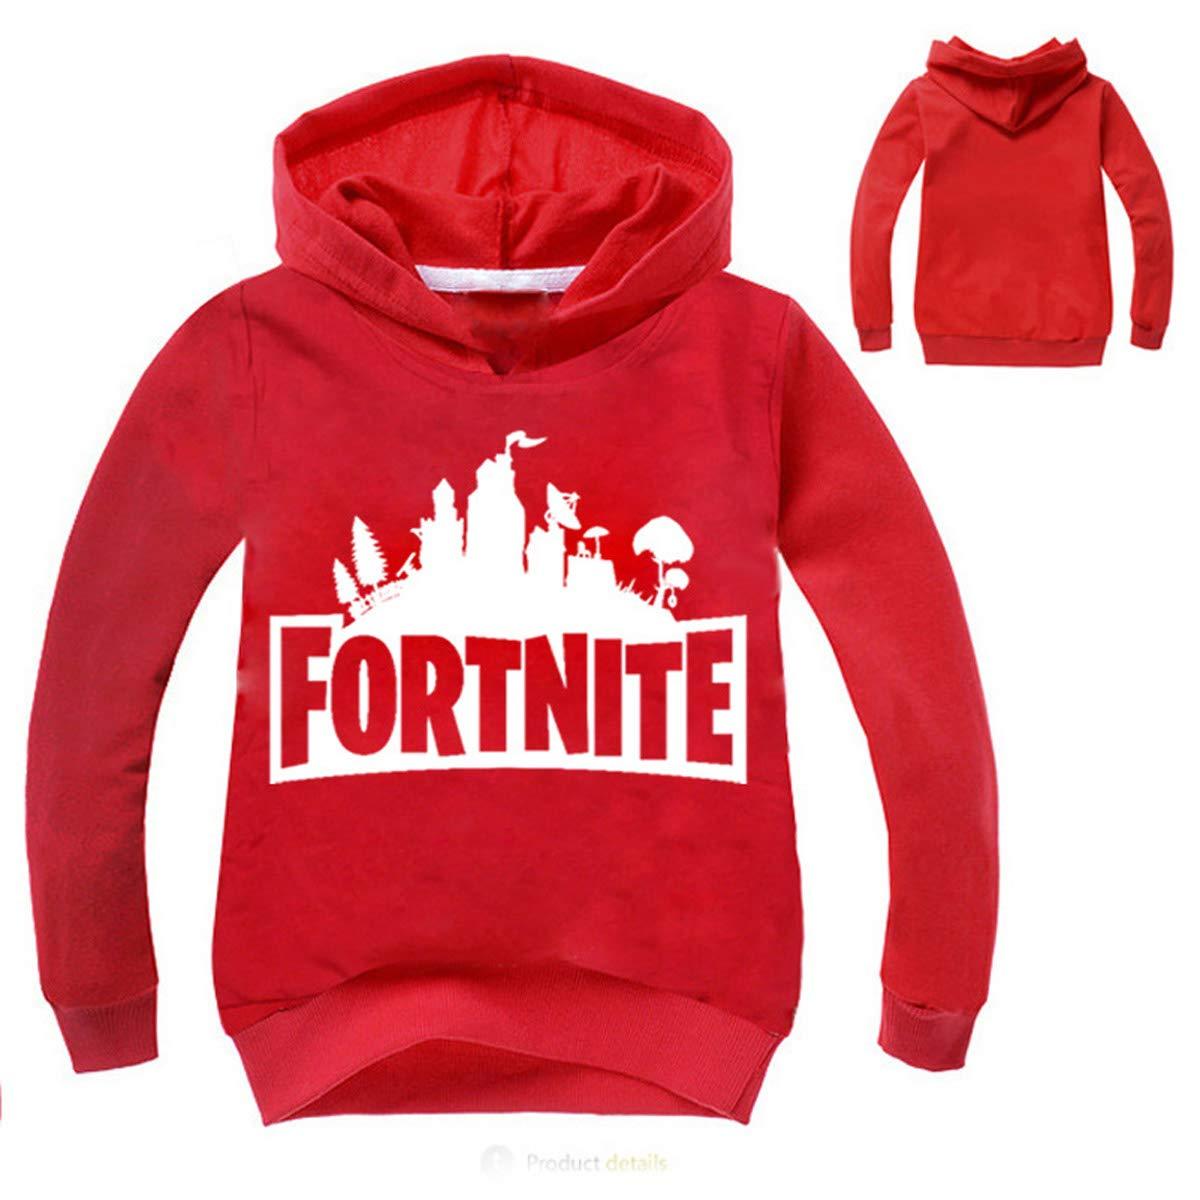 Abel Mall Fortnite Hoodie Hooded Sweatshirt Long Sleeve Jackets for Kids,Boys,Girls